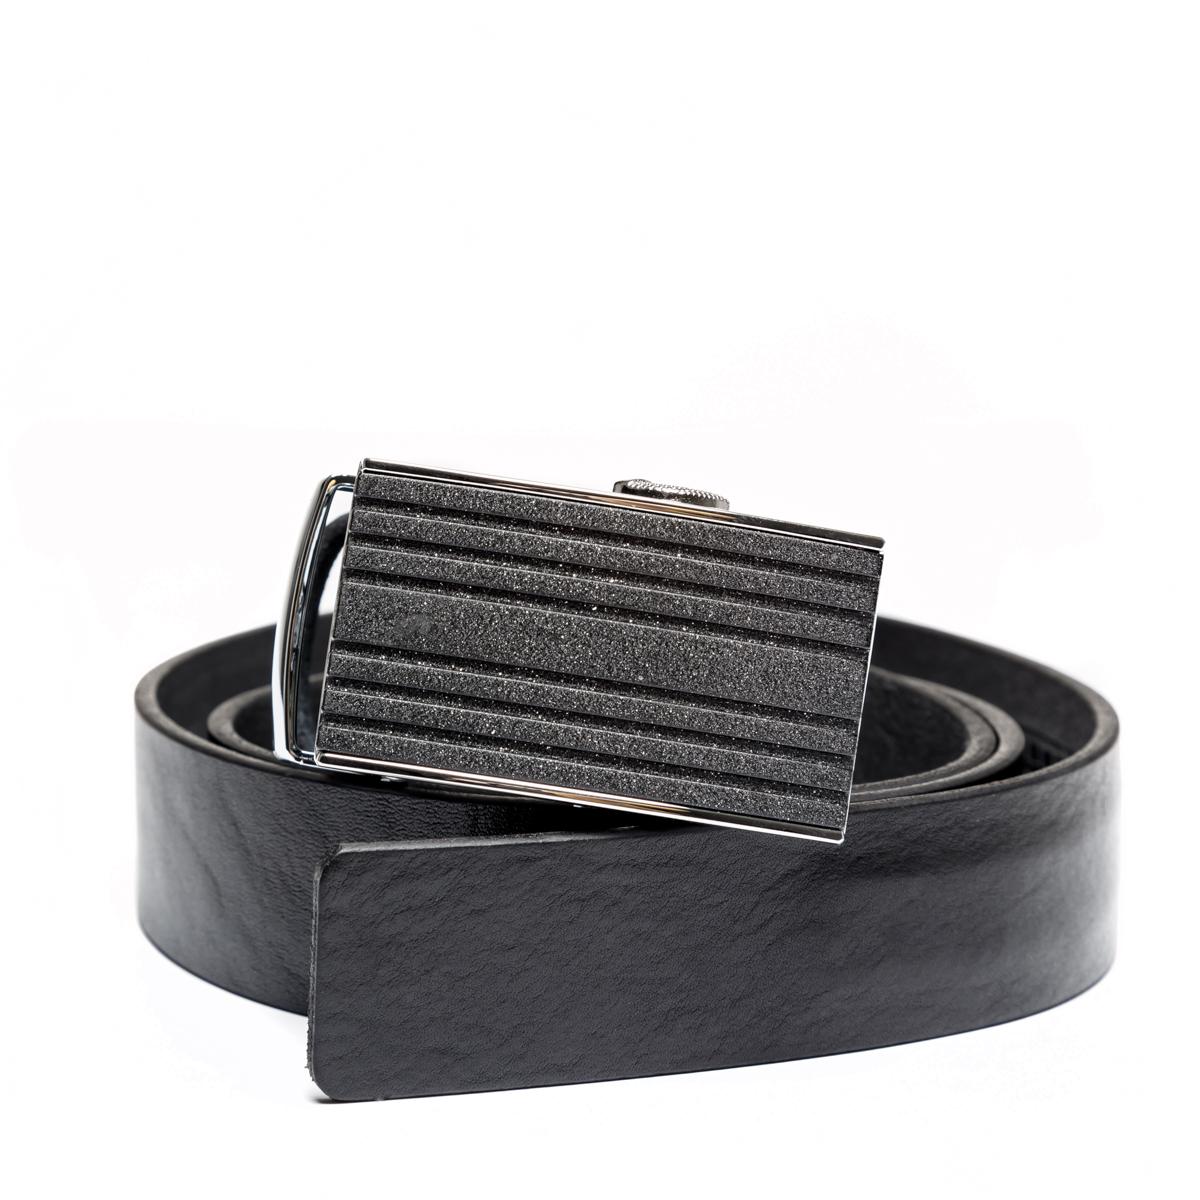 Ремень мужской Flax Black фото